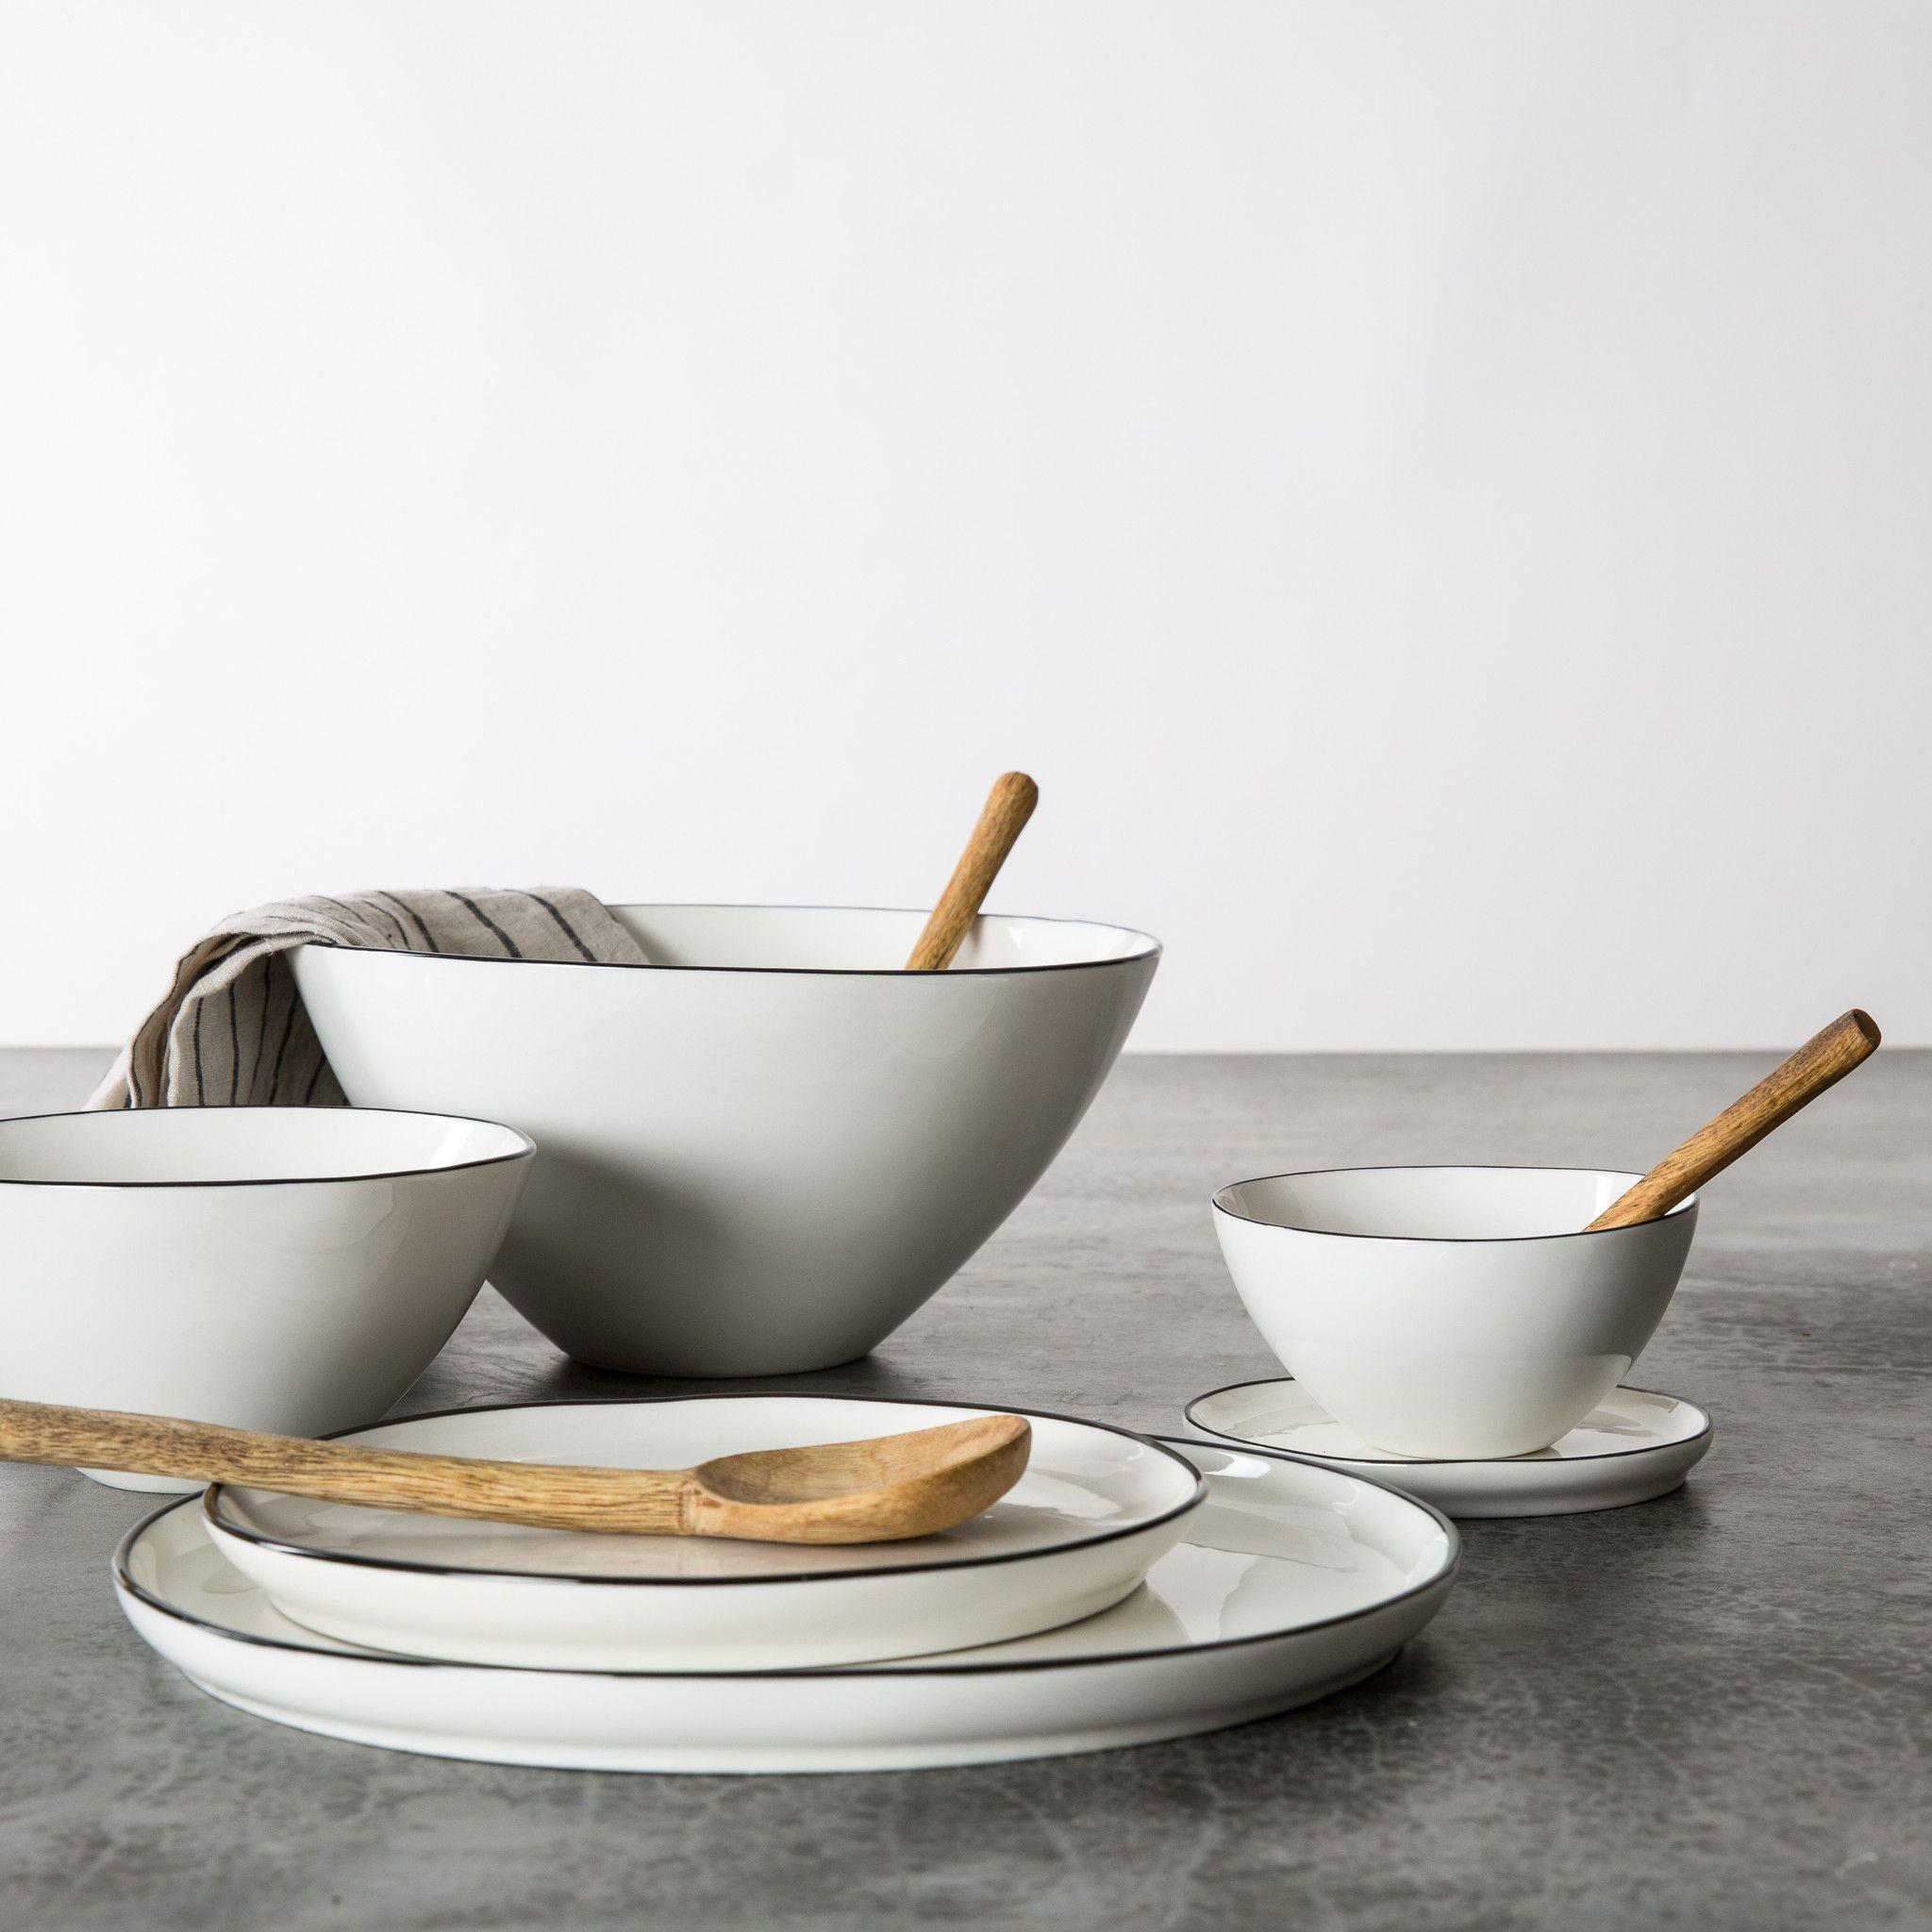 Black Rimmed Plates | Black rims, Joanna gaines and Kitchen design